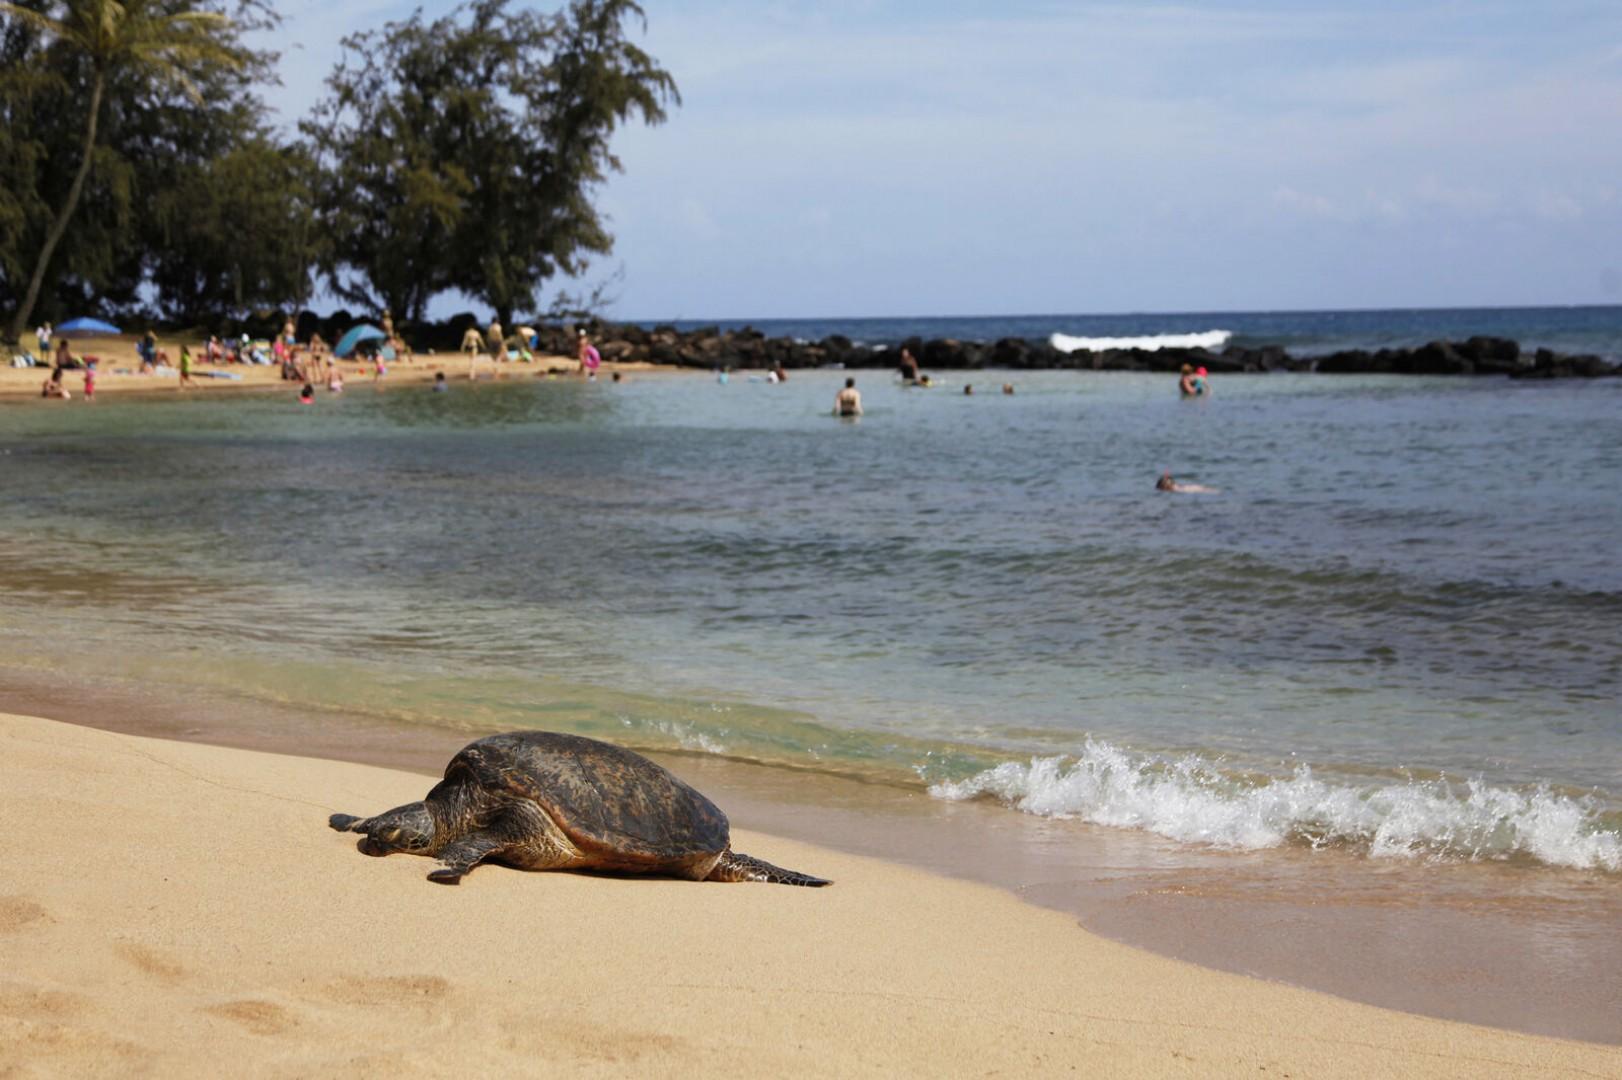 Honu relaxing on the beach